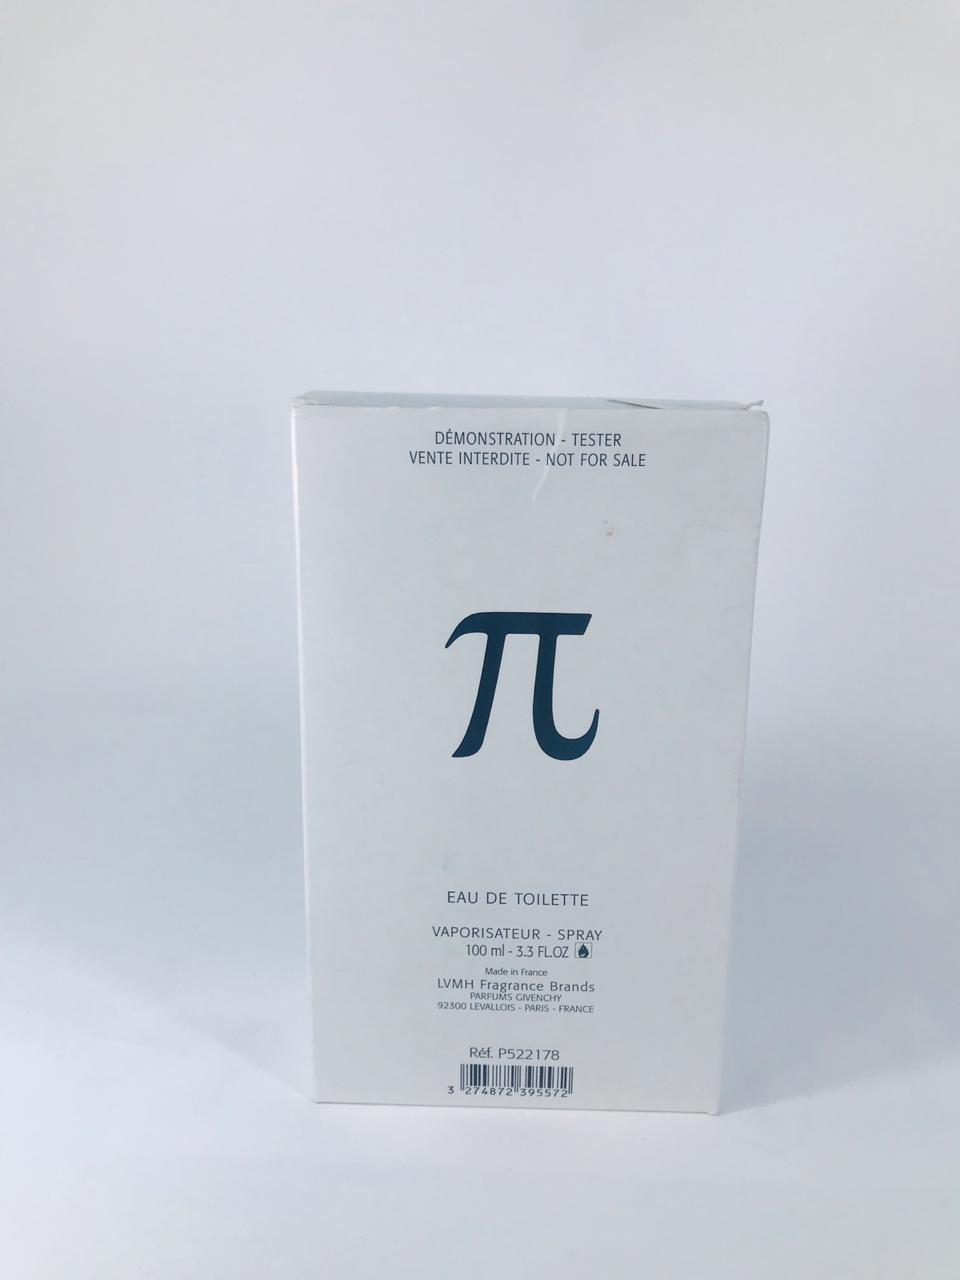 Pi Givenchy Masculino Eau de Toilette 100 ml - Tester